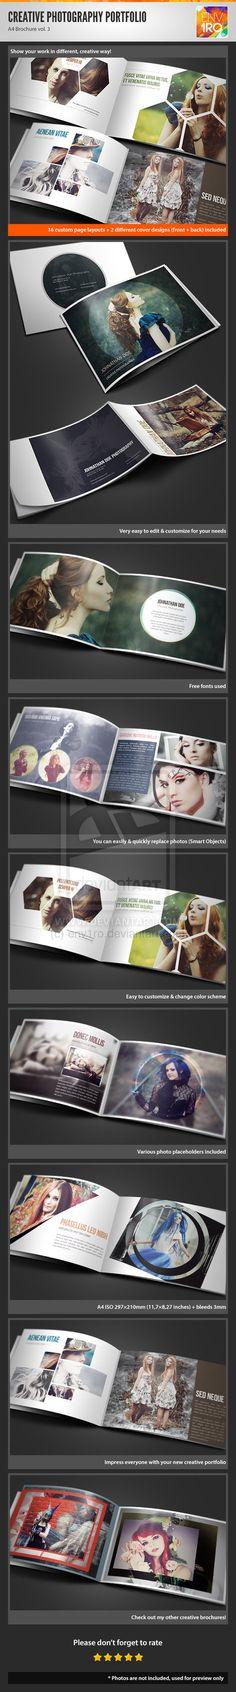 28_Creative Photography Portfolio A4 Brochure